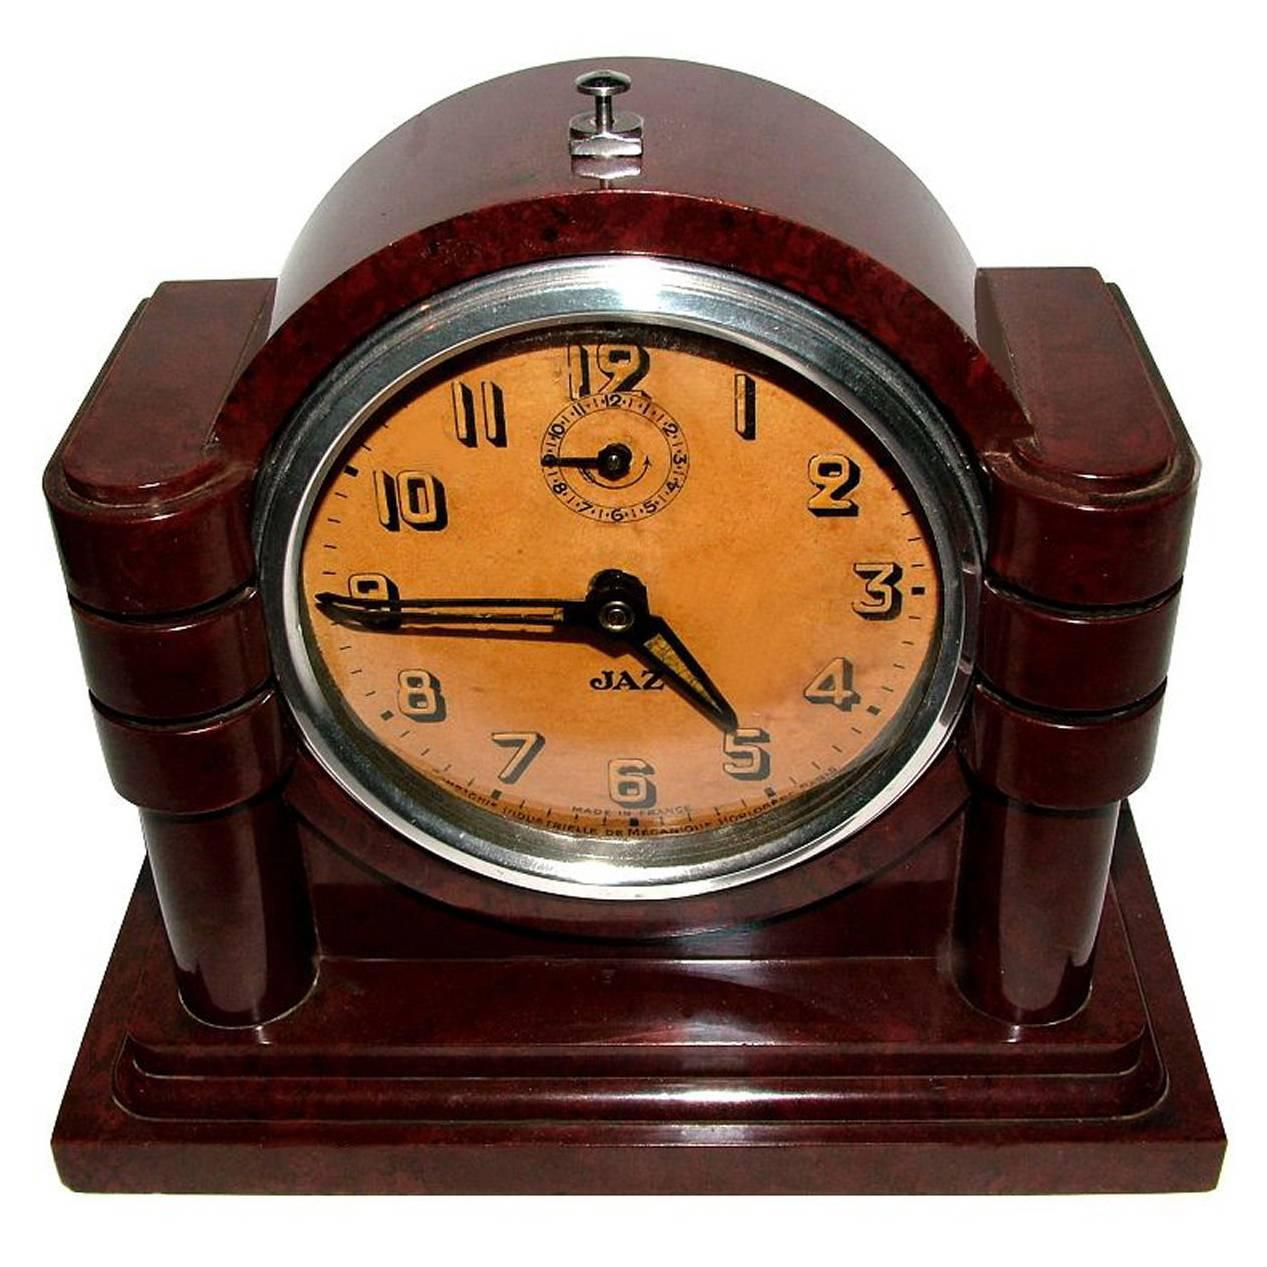 French 1930s Art Deco Bakelite Clock by JAZ